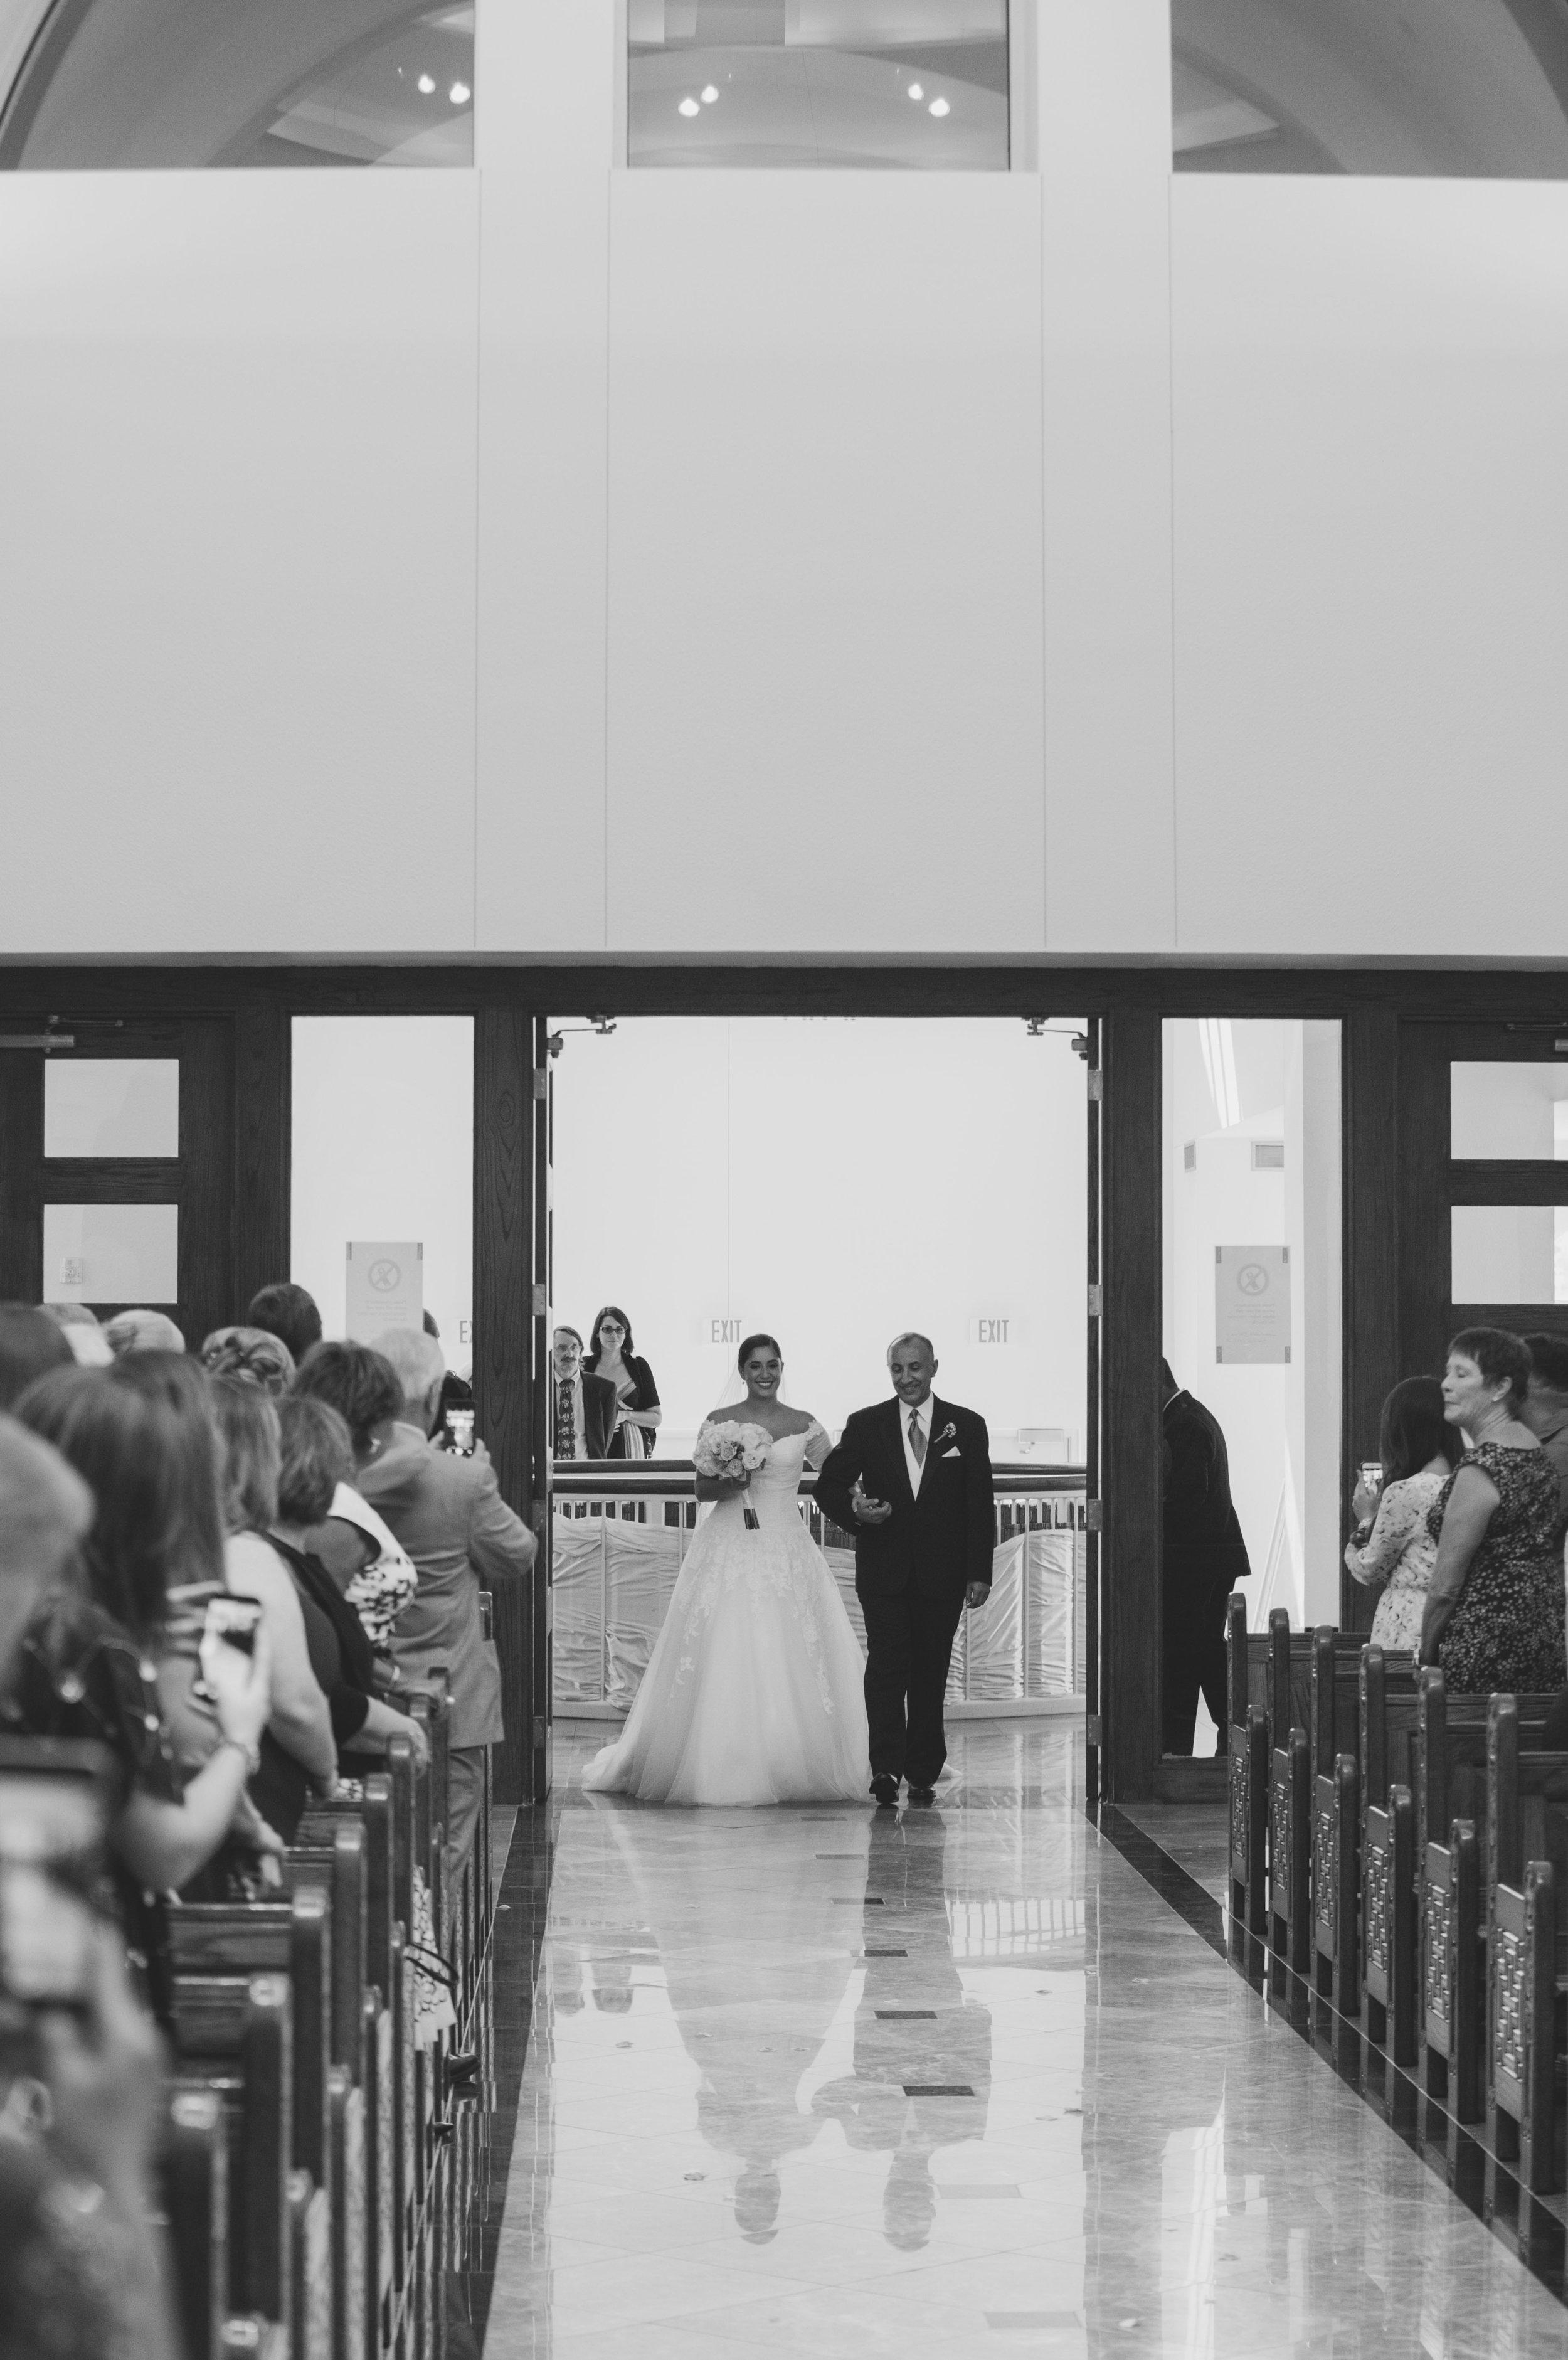 ATGI_Magali & Josh Wedding_2S8A0580.jpg